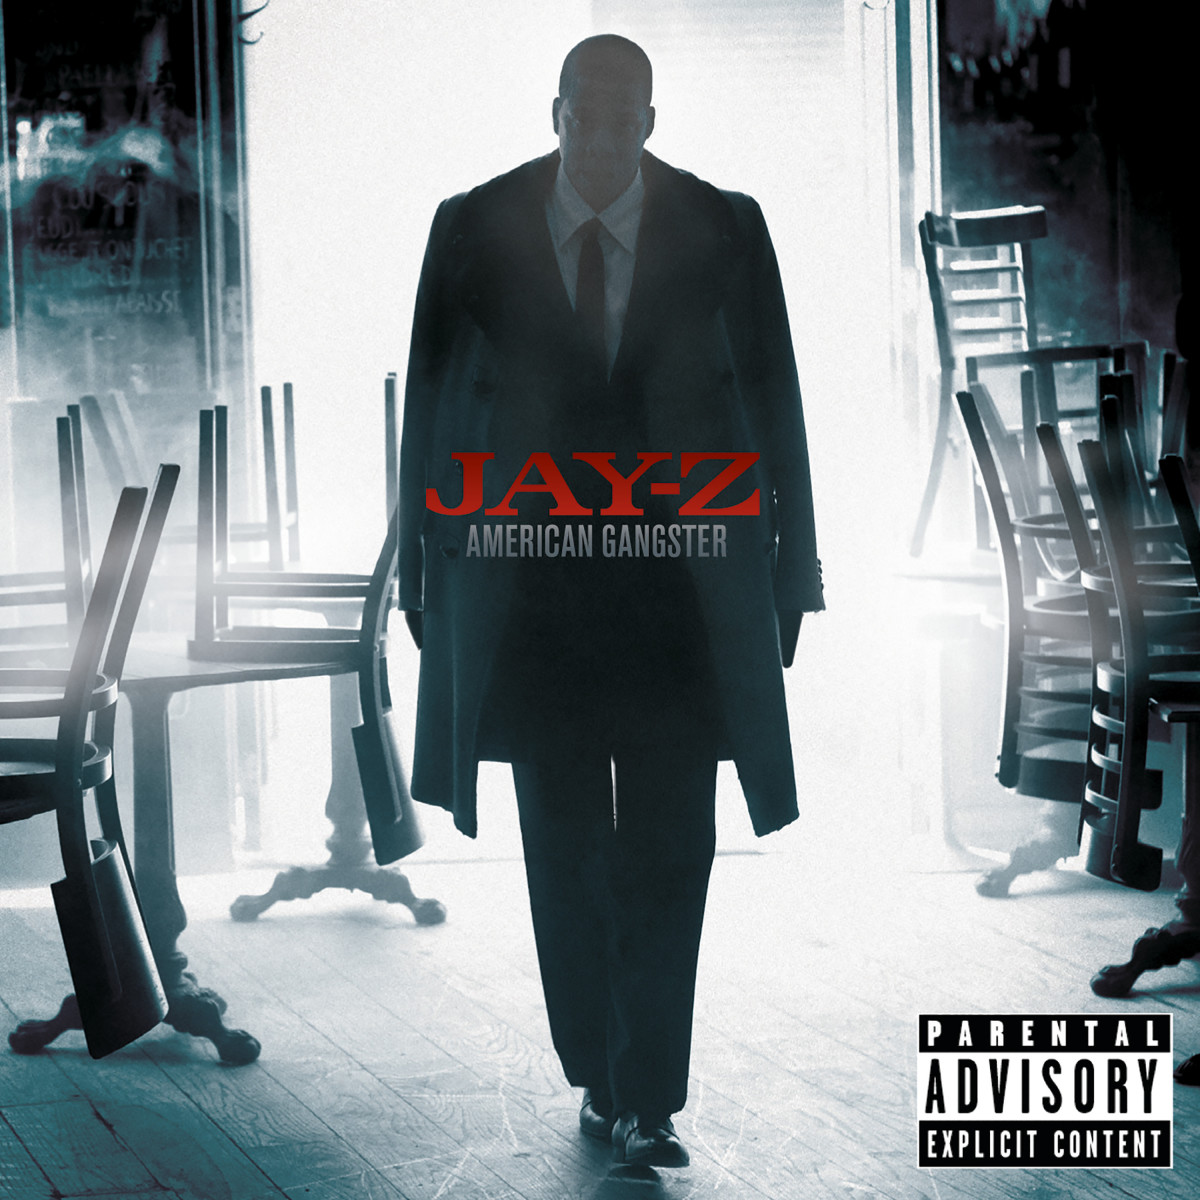 jay-z-american-gangster